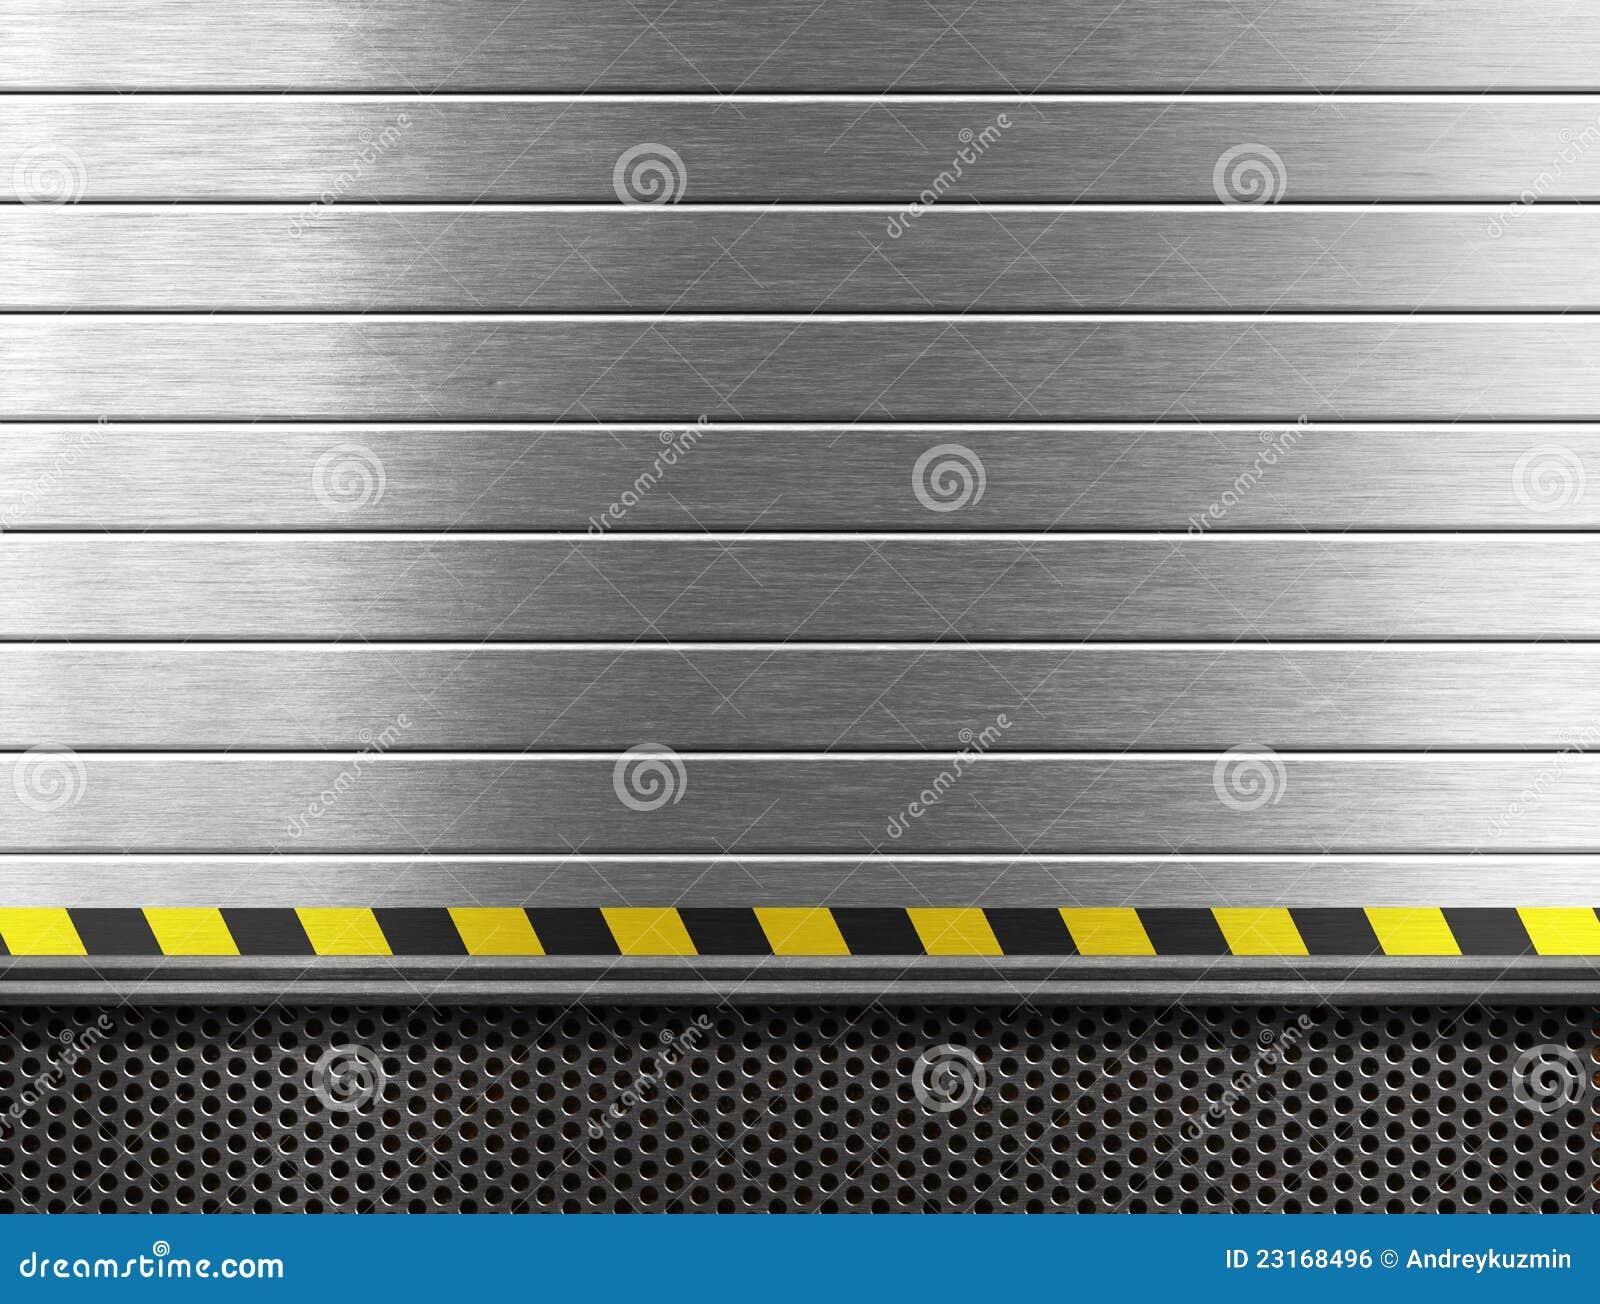 Metal industrial background with hazard stripes